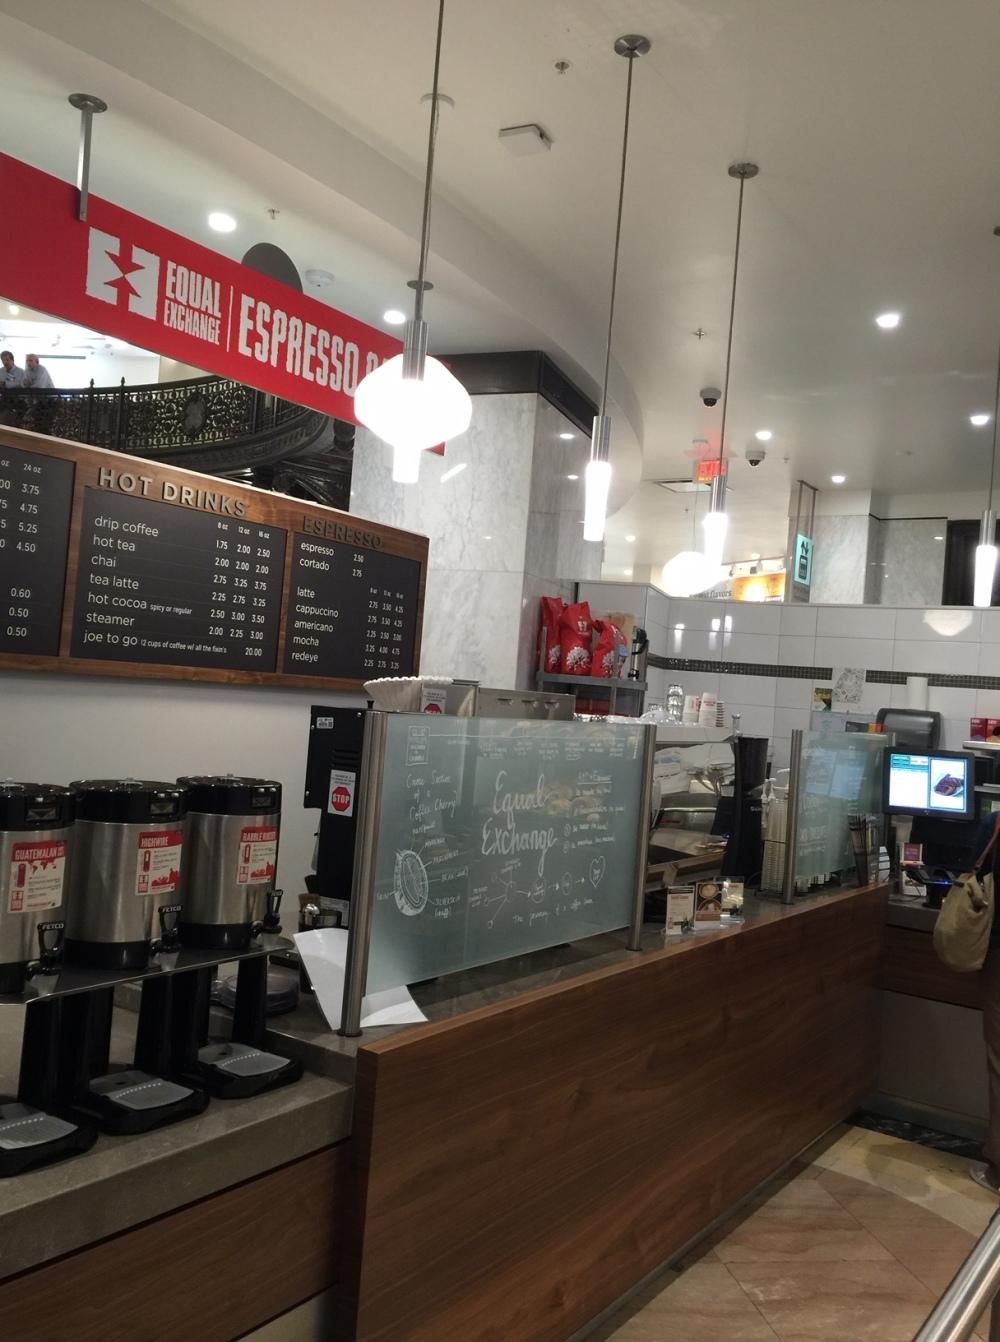 equal-exchange-espresso-bar-2